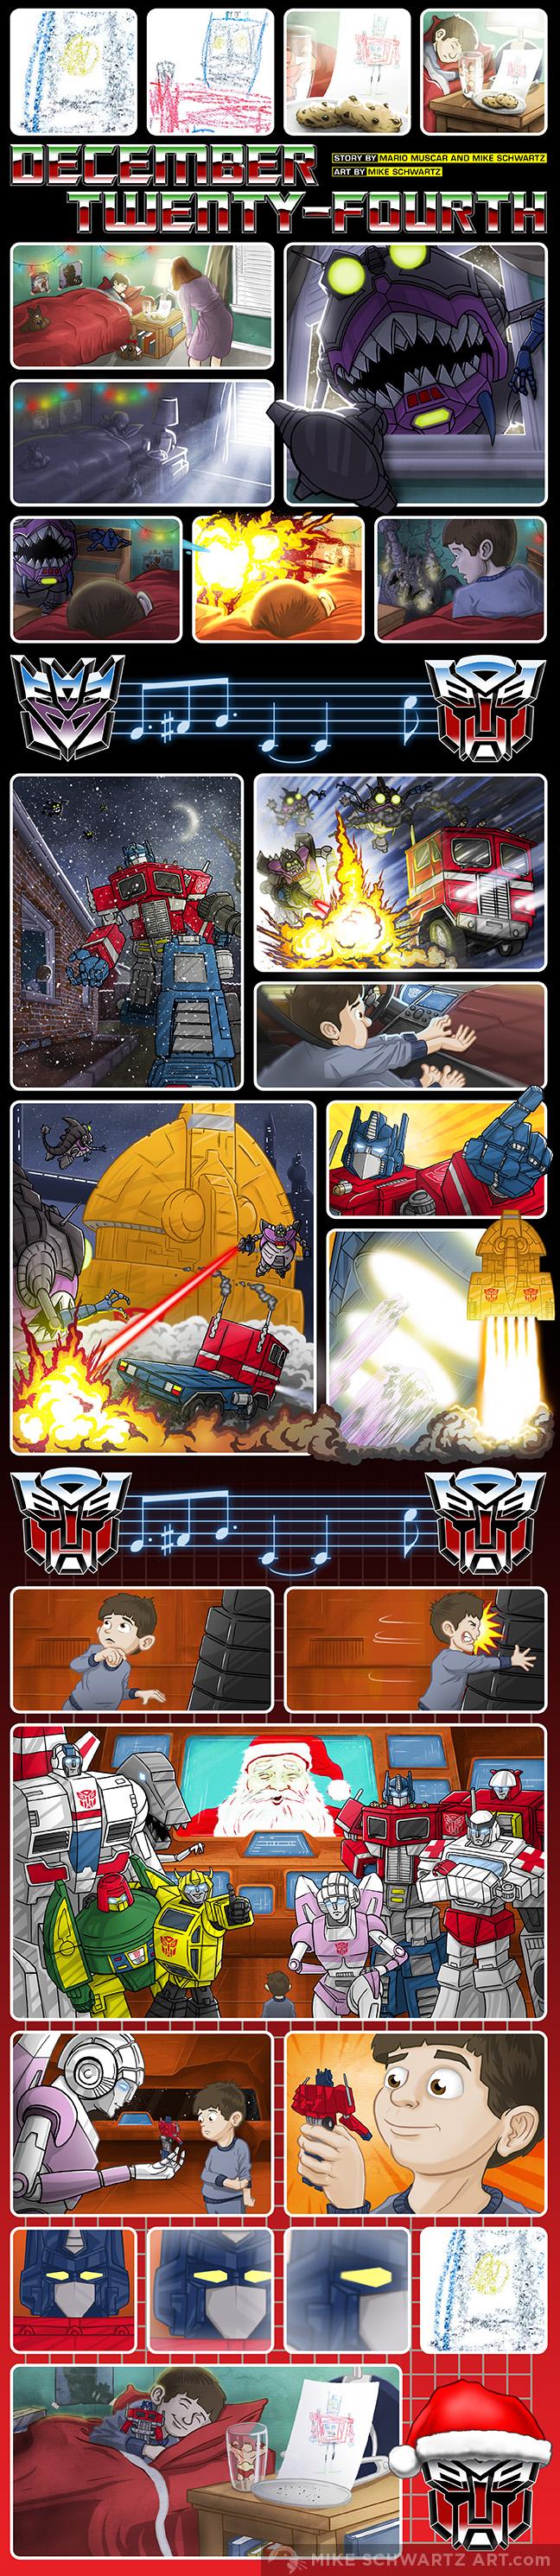 Mike-Schwartz-Illustration-December-Twenty-Fourth-Transformers-Full.jpg